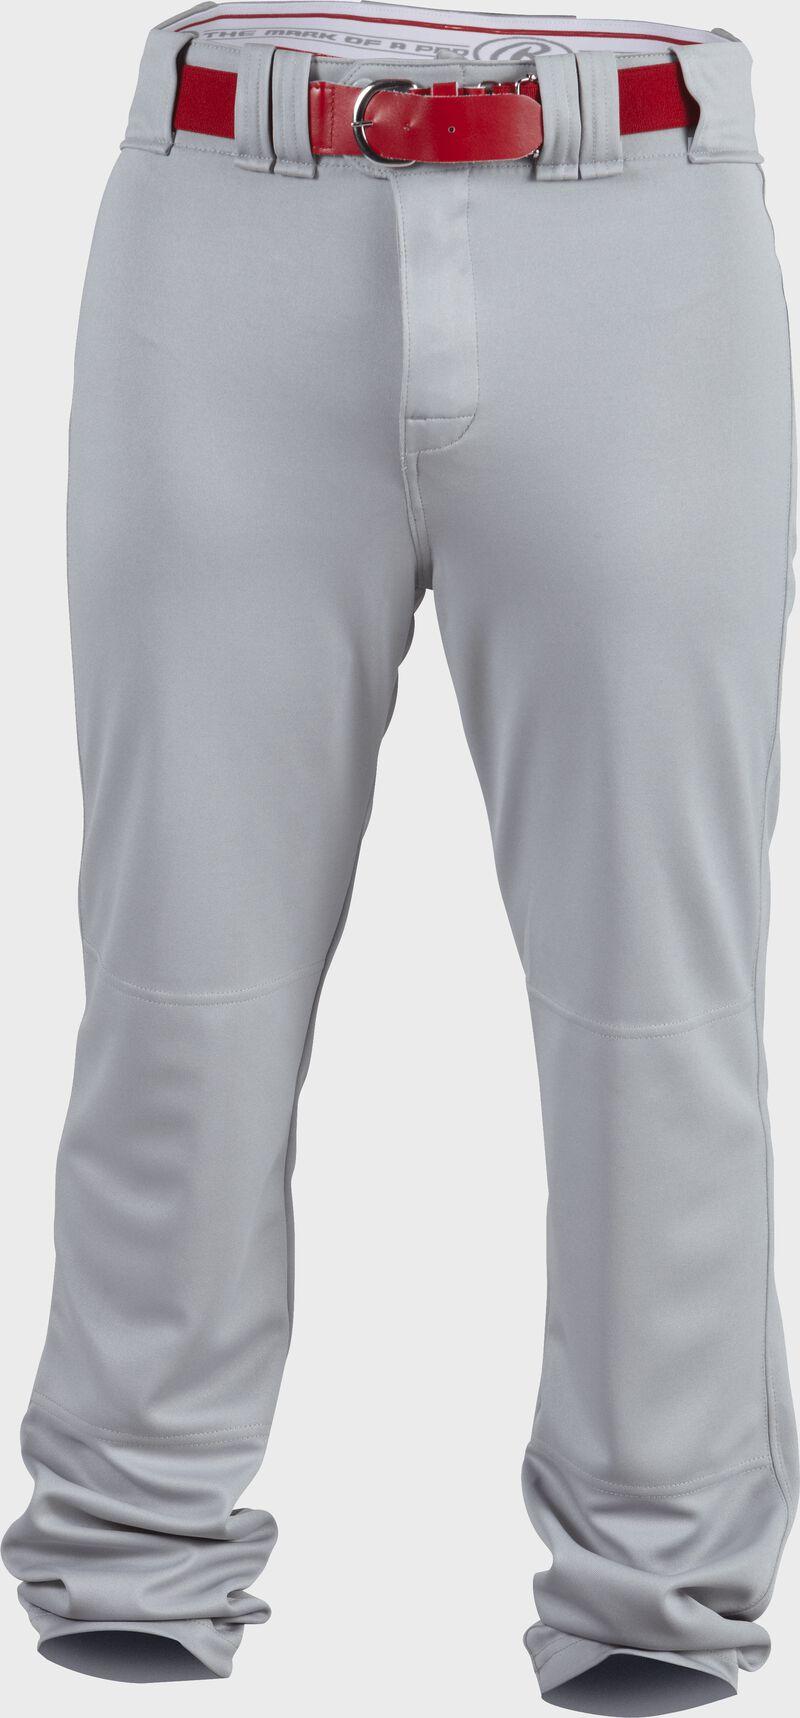 Front of Rawlings Blue Gray Adult Premium Straight Baseball Pant - SKU #PPU140